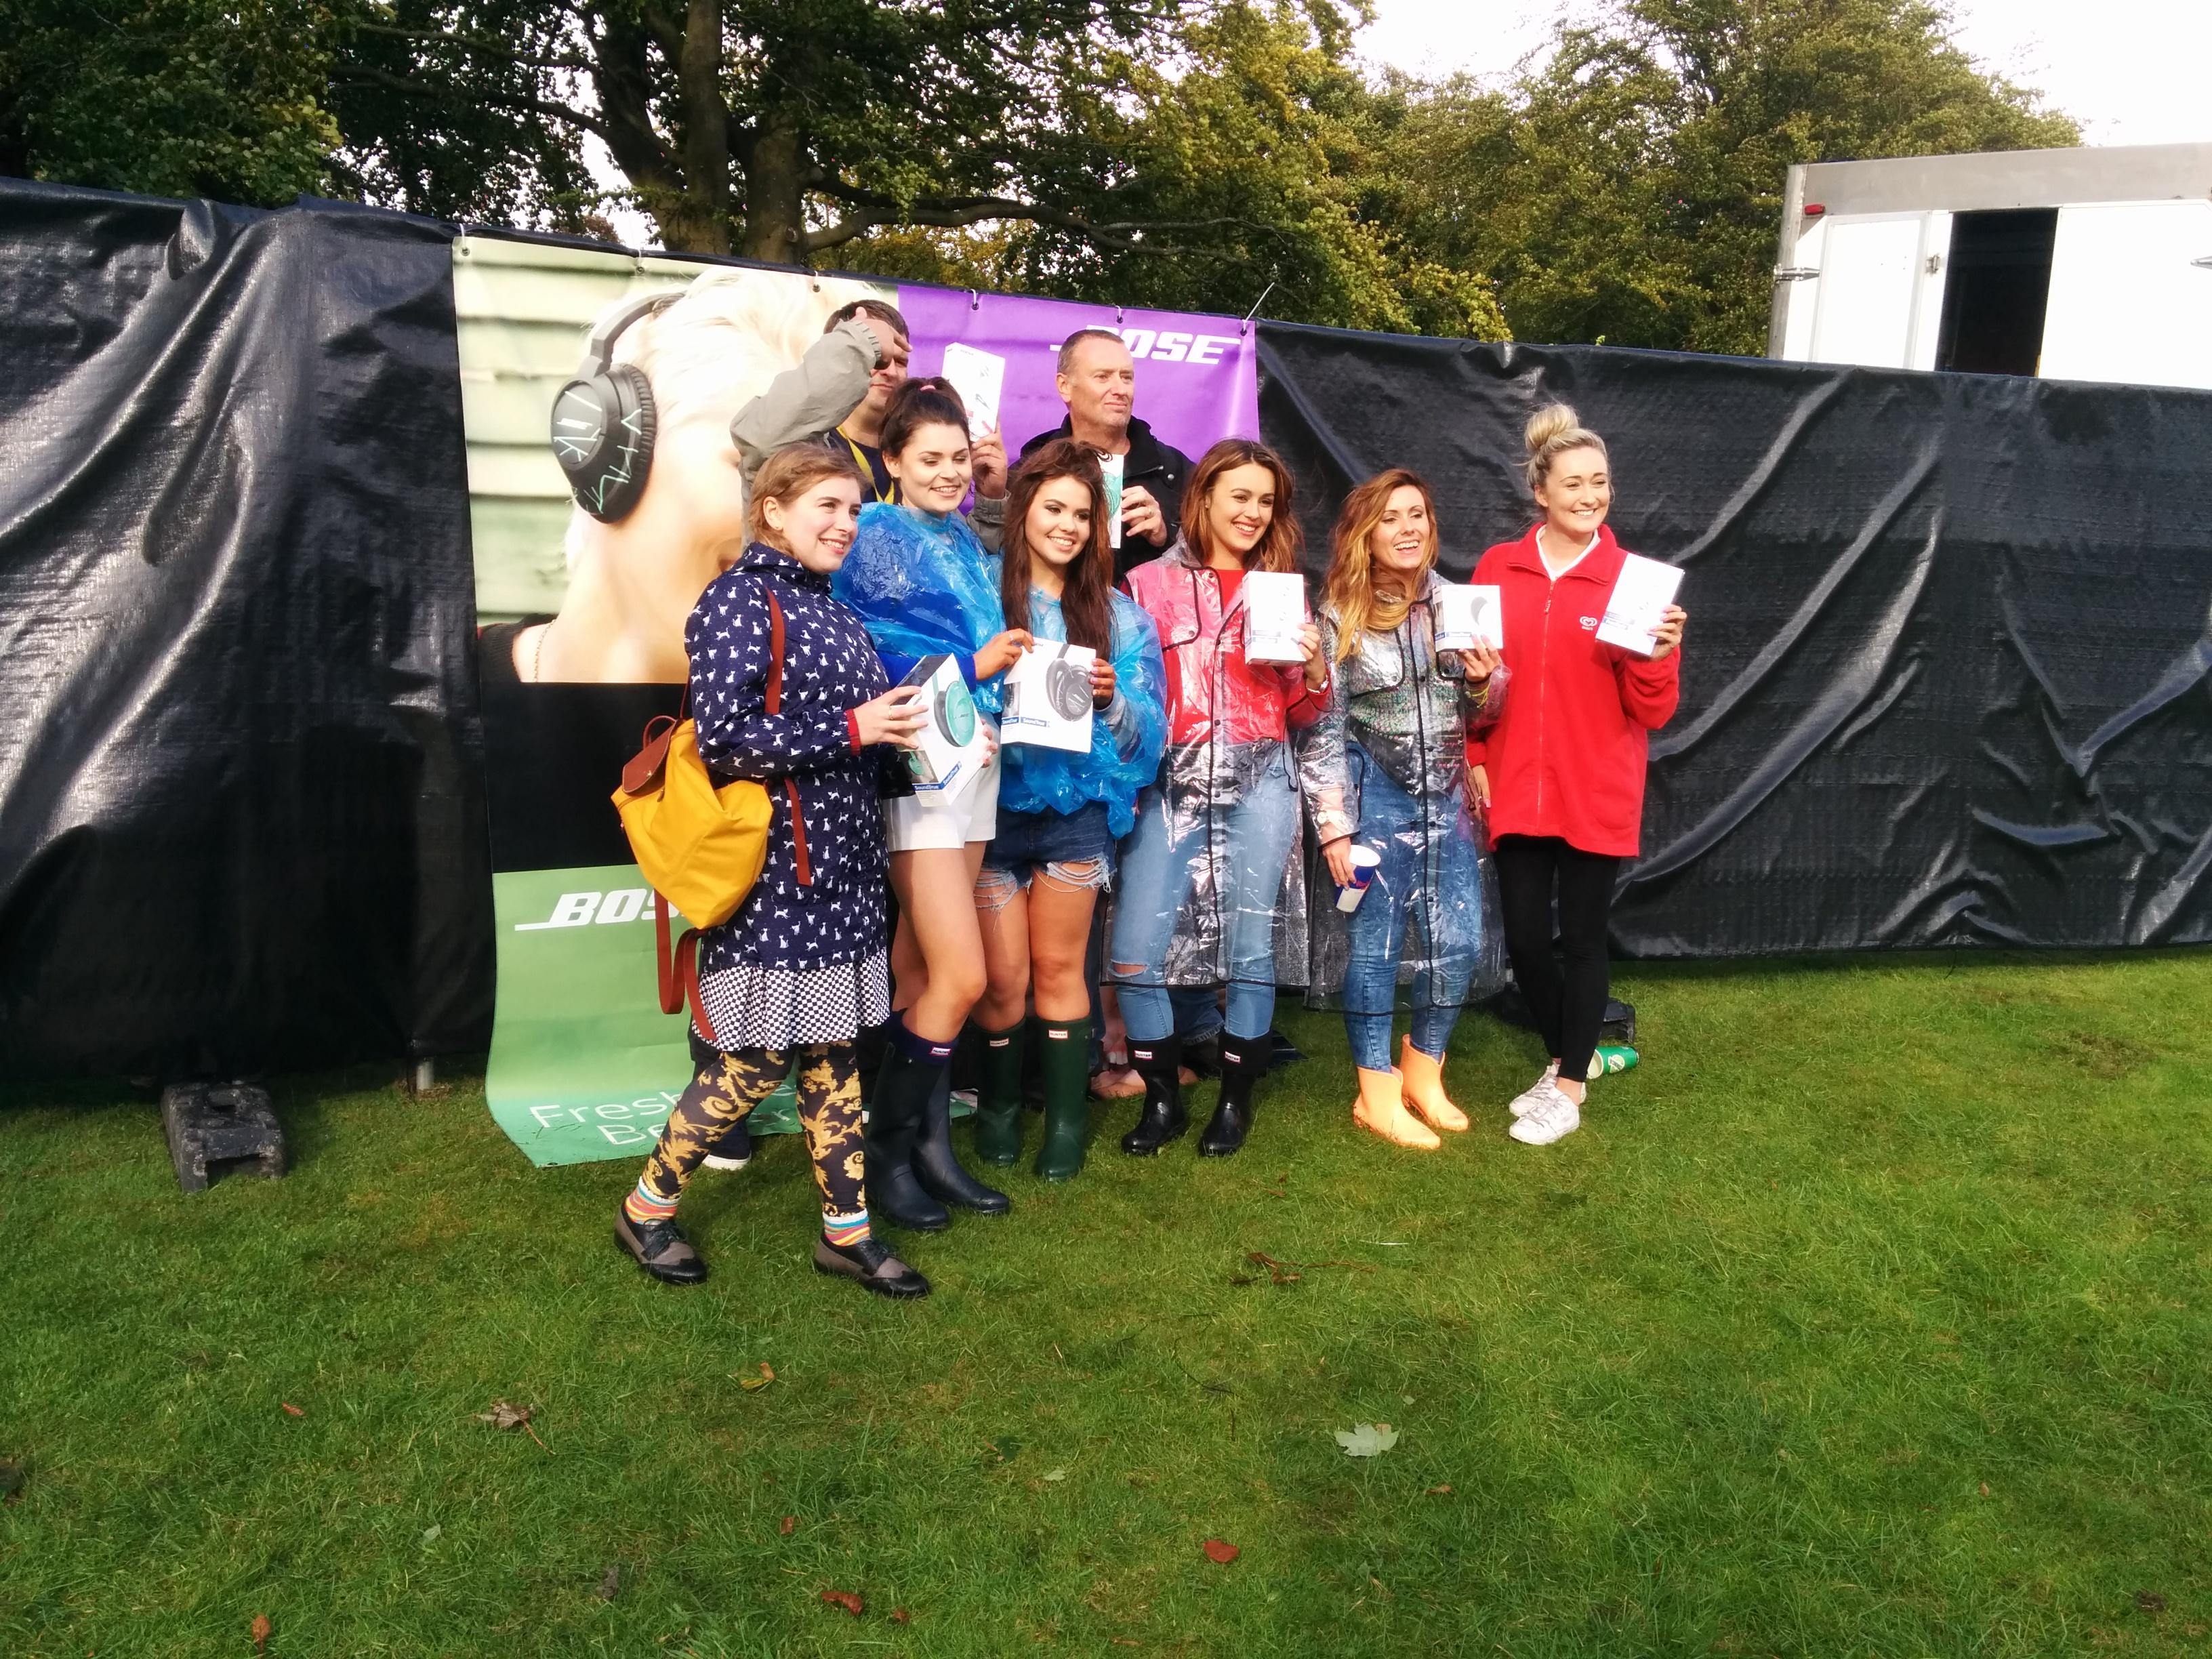 Daisybutter - UK Fashion and Lifestyle Blog: Bose Yozilla headphones, Glasgow Summer Sessions, Bose Festivals, #ListenForYourself